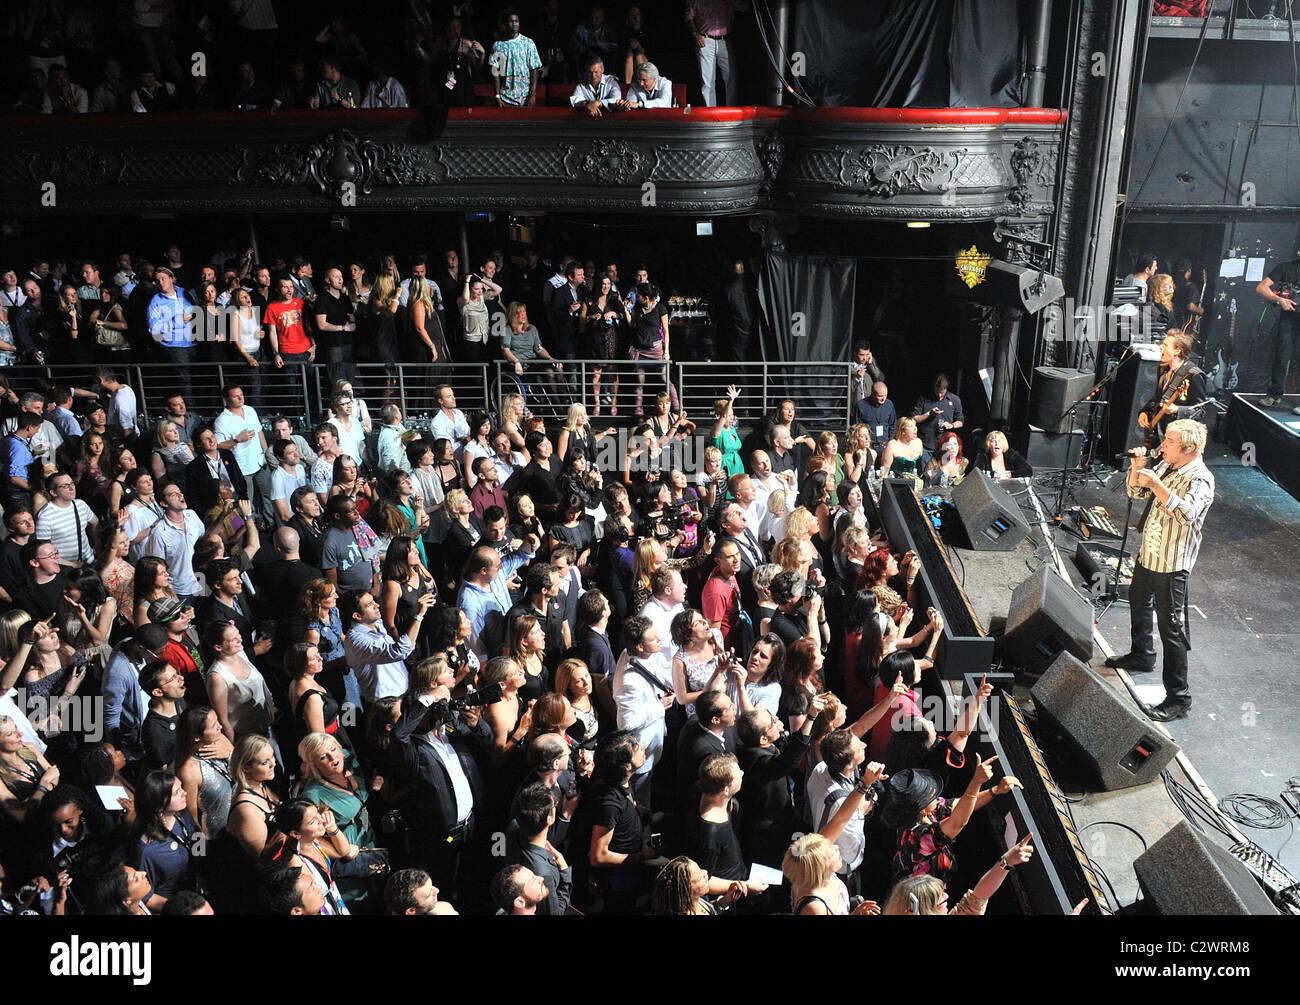 duran duran perform at the smirnoff experience at la cigale stock photo royalty free